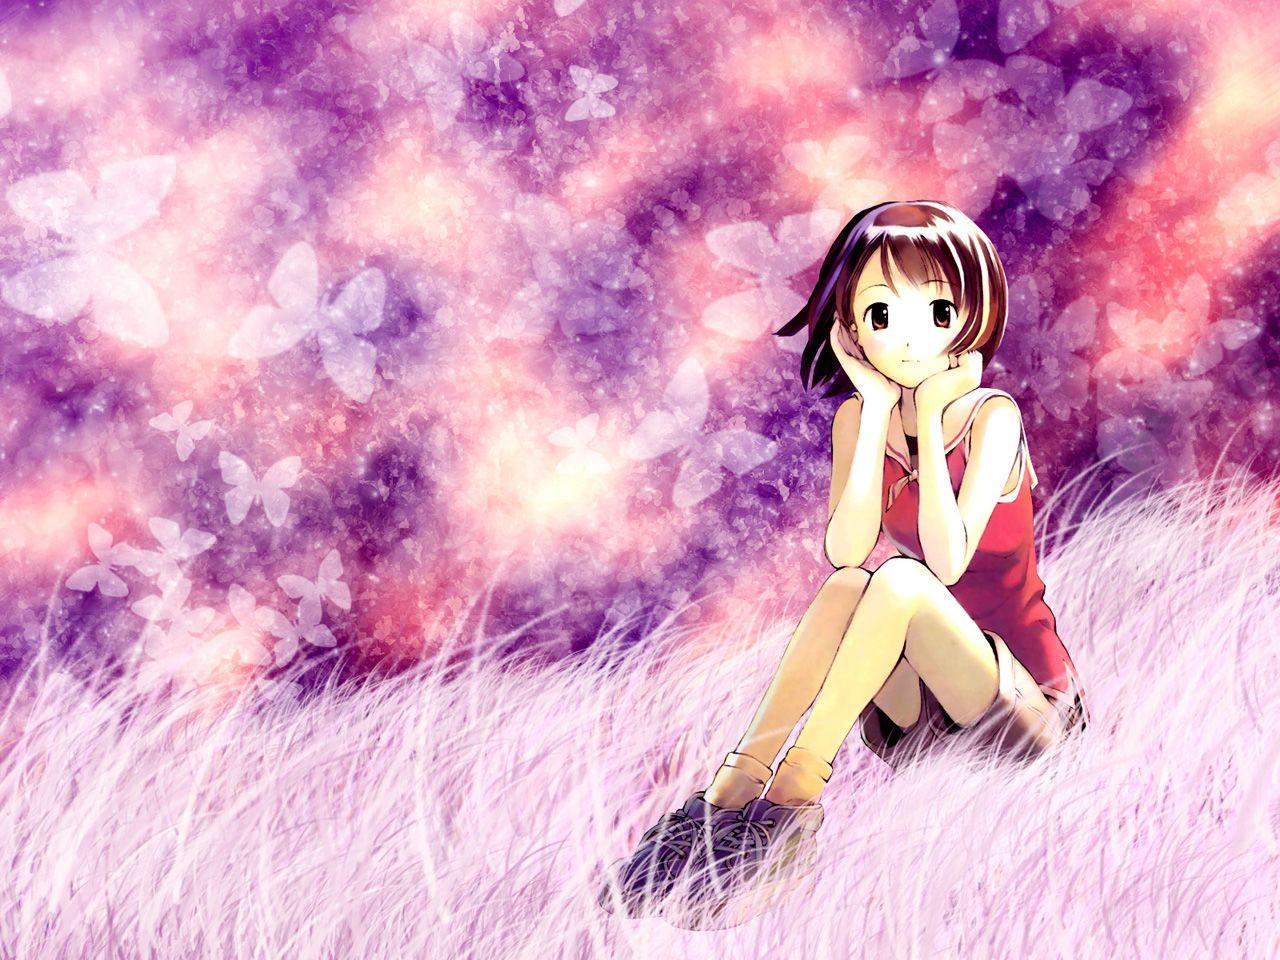 Anime Cuteness Free Cute Anime Girl Computer Desktop Wallpapers